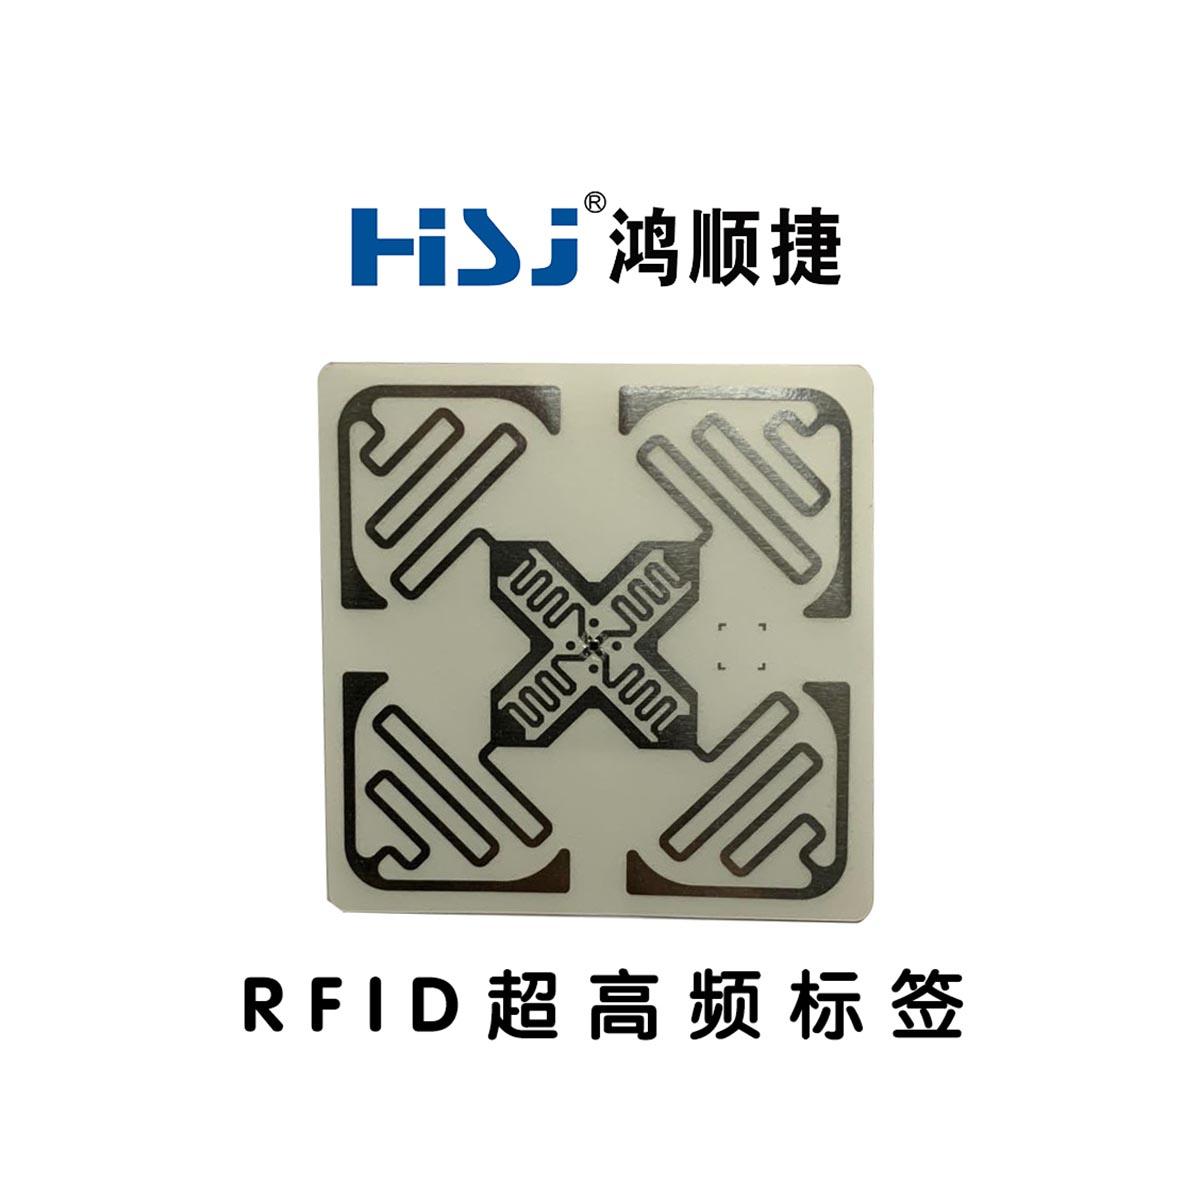 RFID电子标签的基本分类